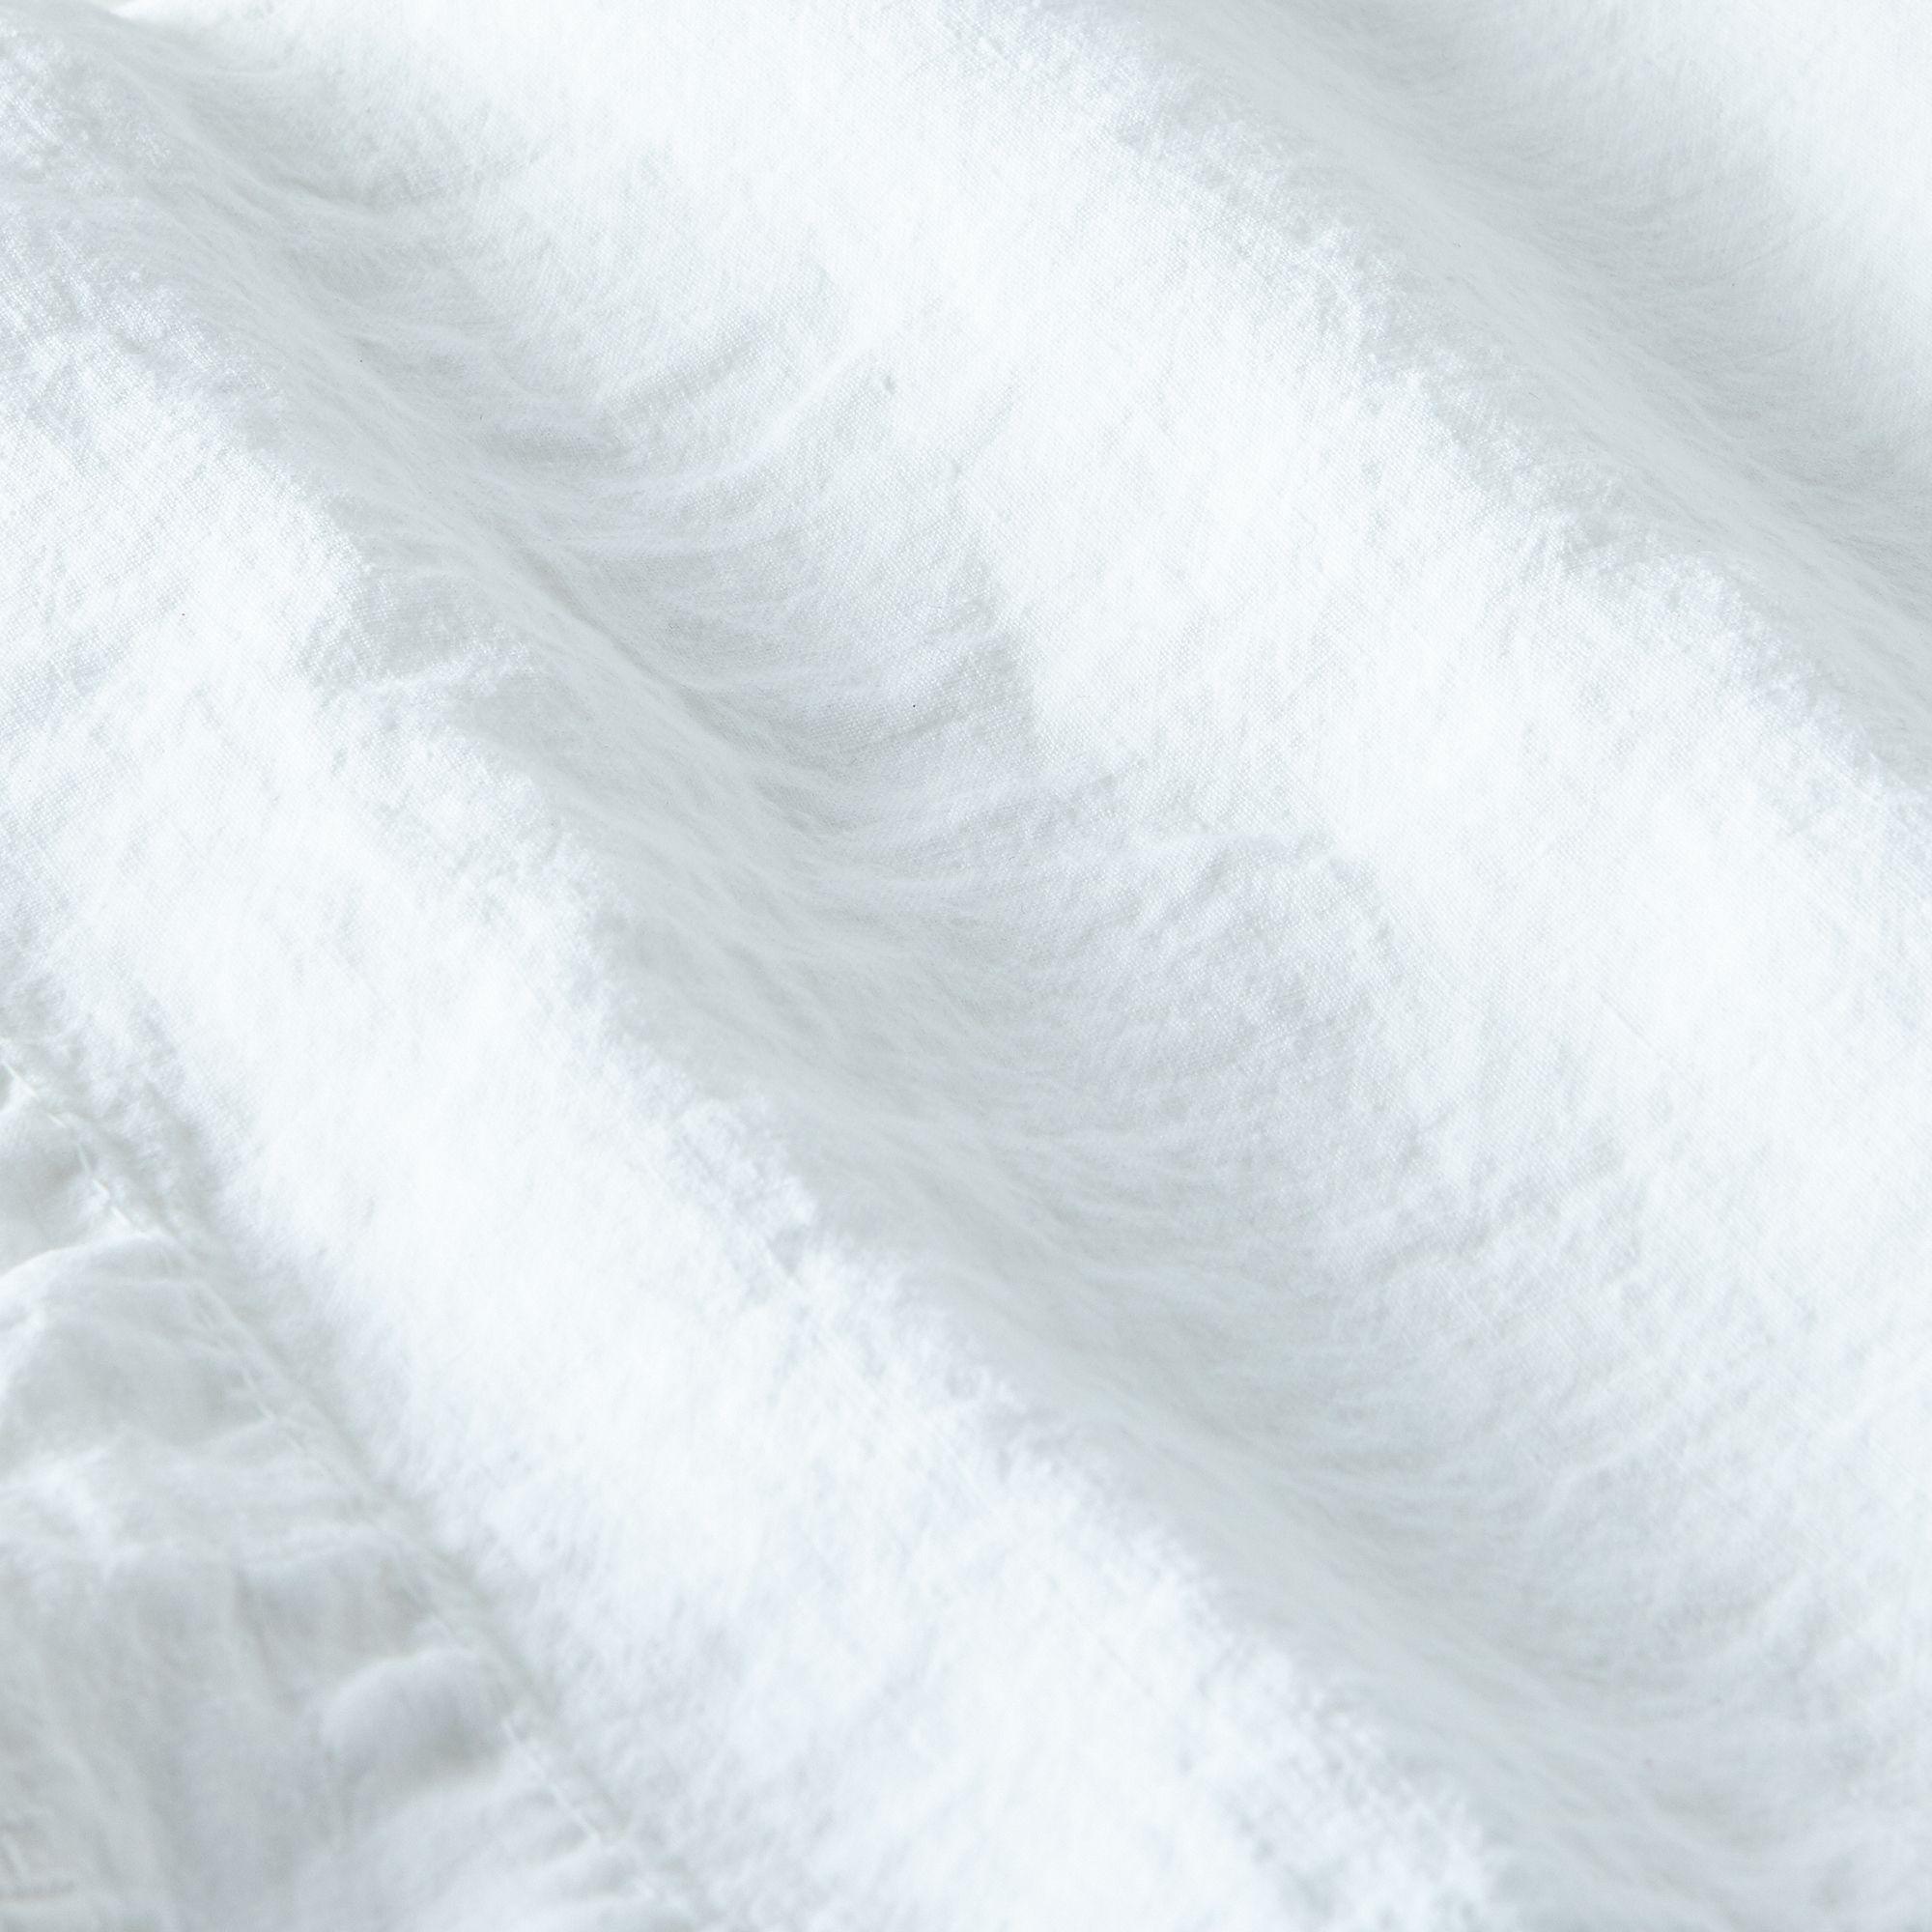 1b1839b2 a0f9 11e5 a190 0ef7535729df  2015 1008 hawkins ny stonewashed linen bedding sheet white silo rocky luten 009